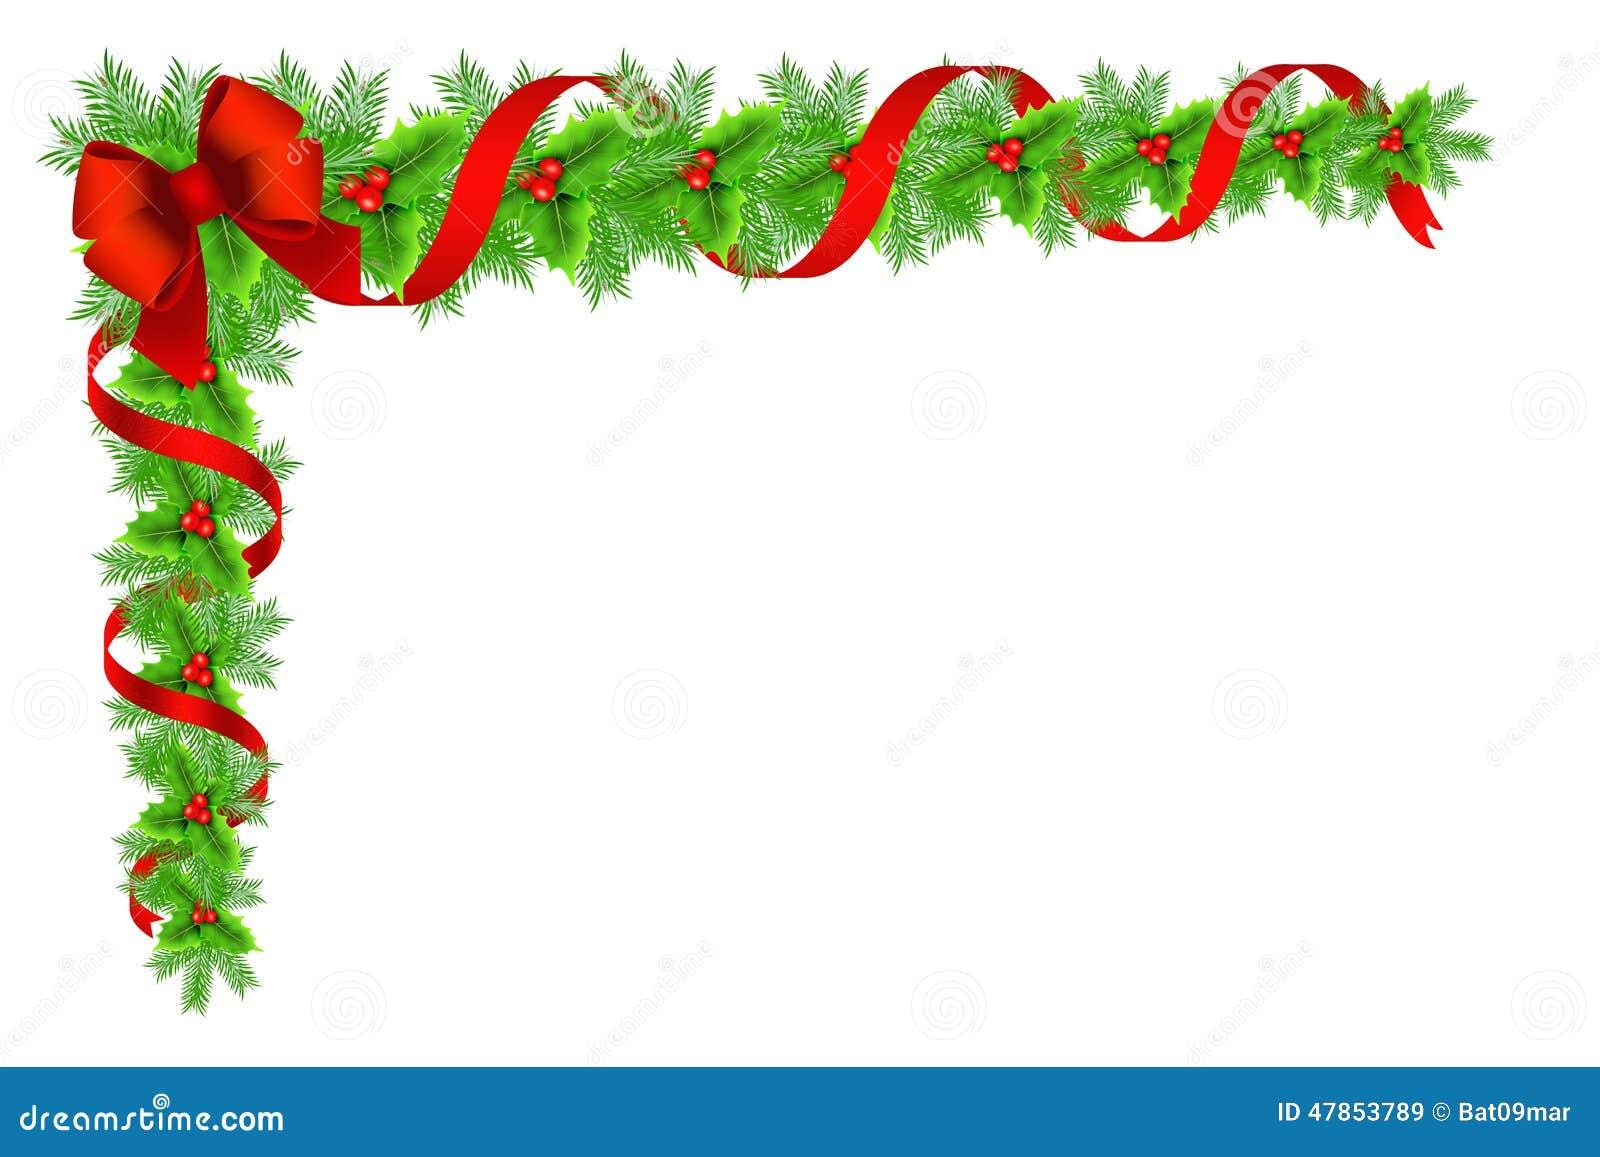 christmas holly border decoration stock illustration. Black Bedroom Furniture Sets. Home Design Ideas